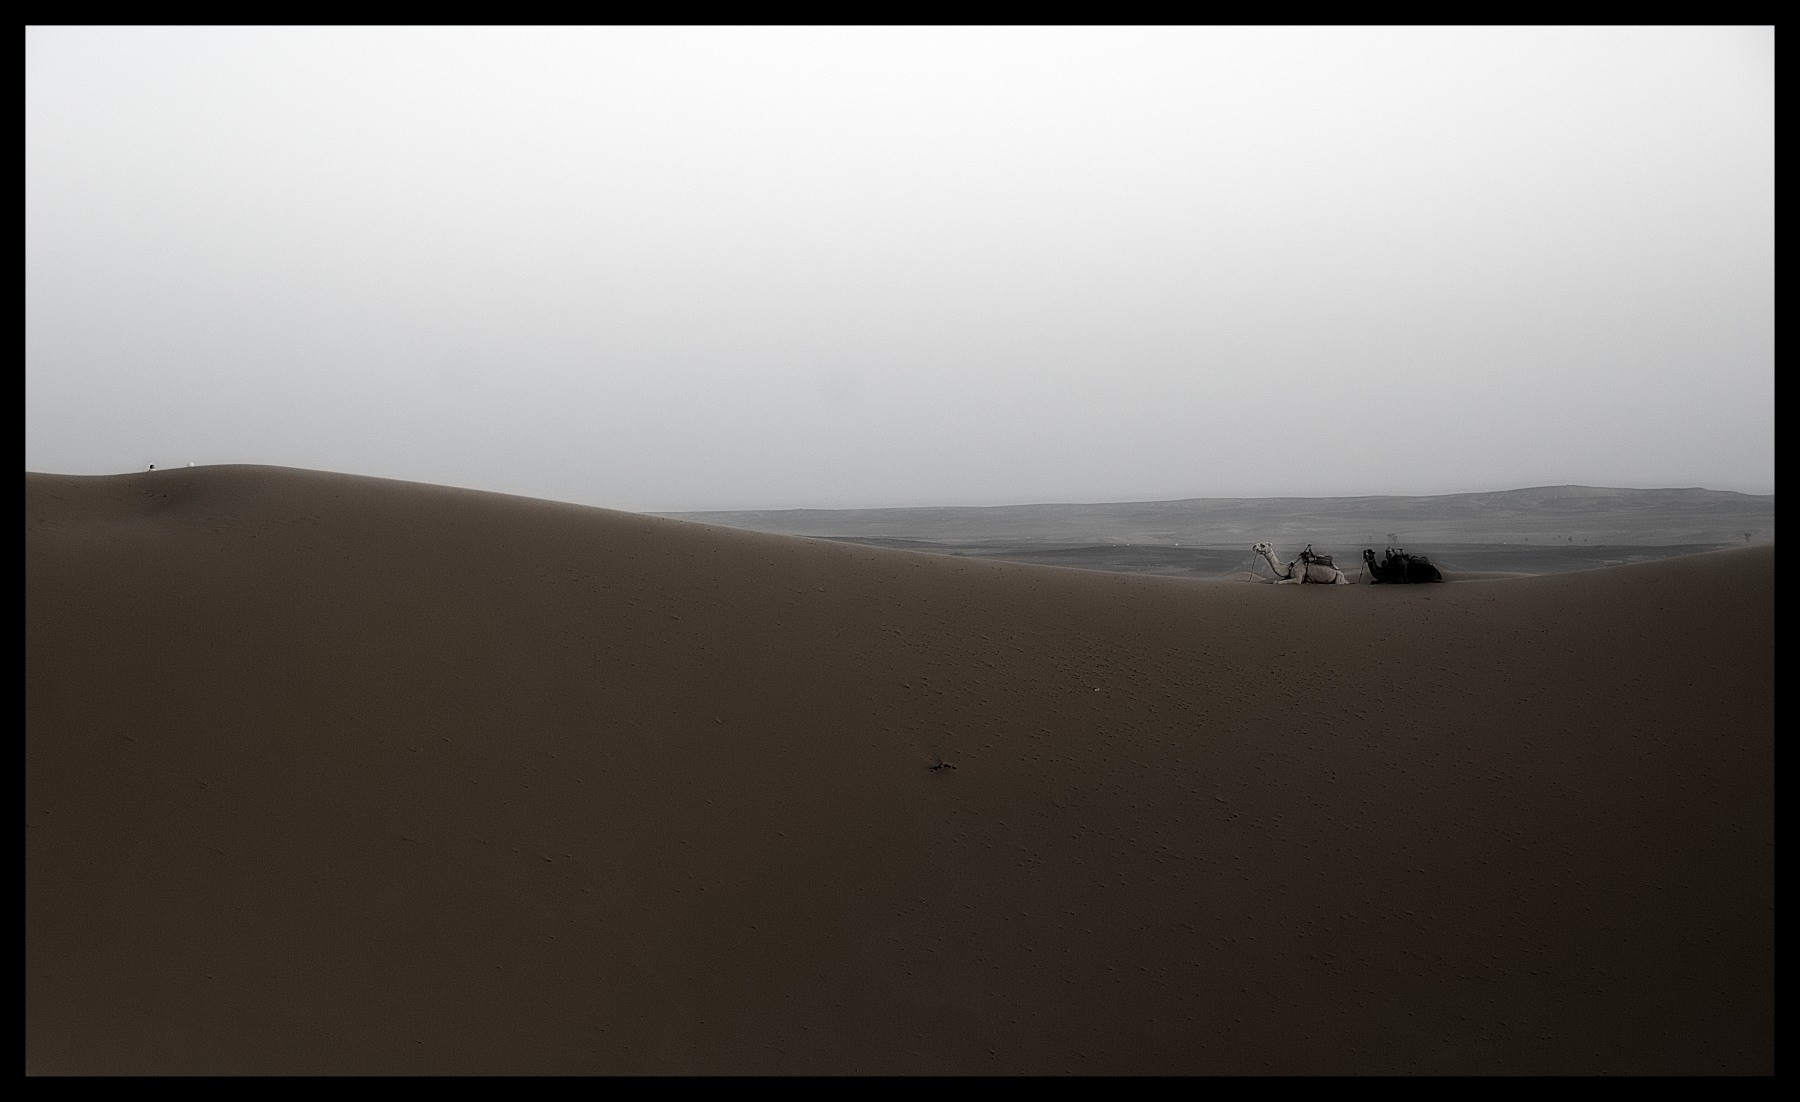 101218_DSC0054-camel Storie di Luce